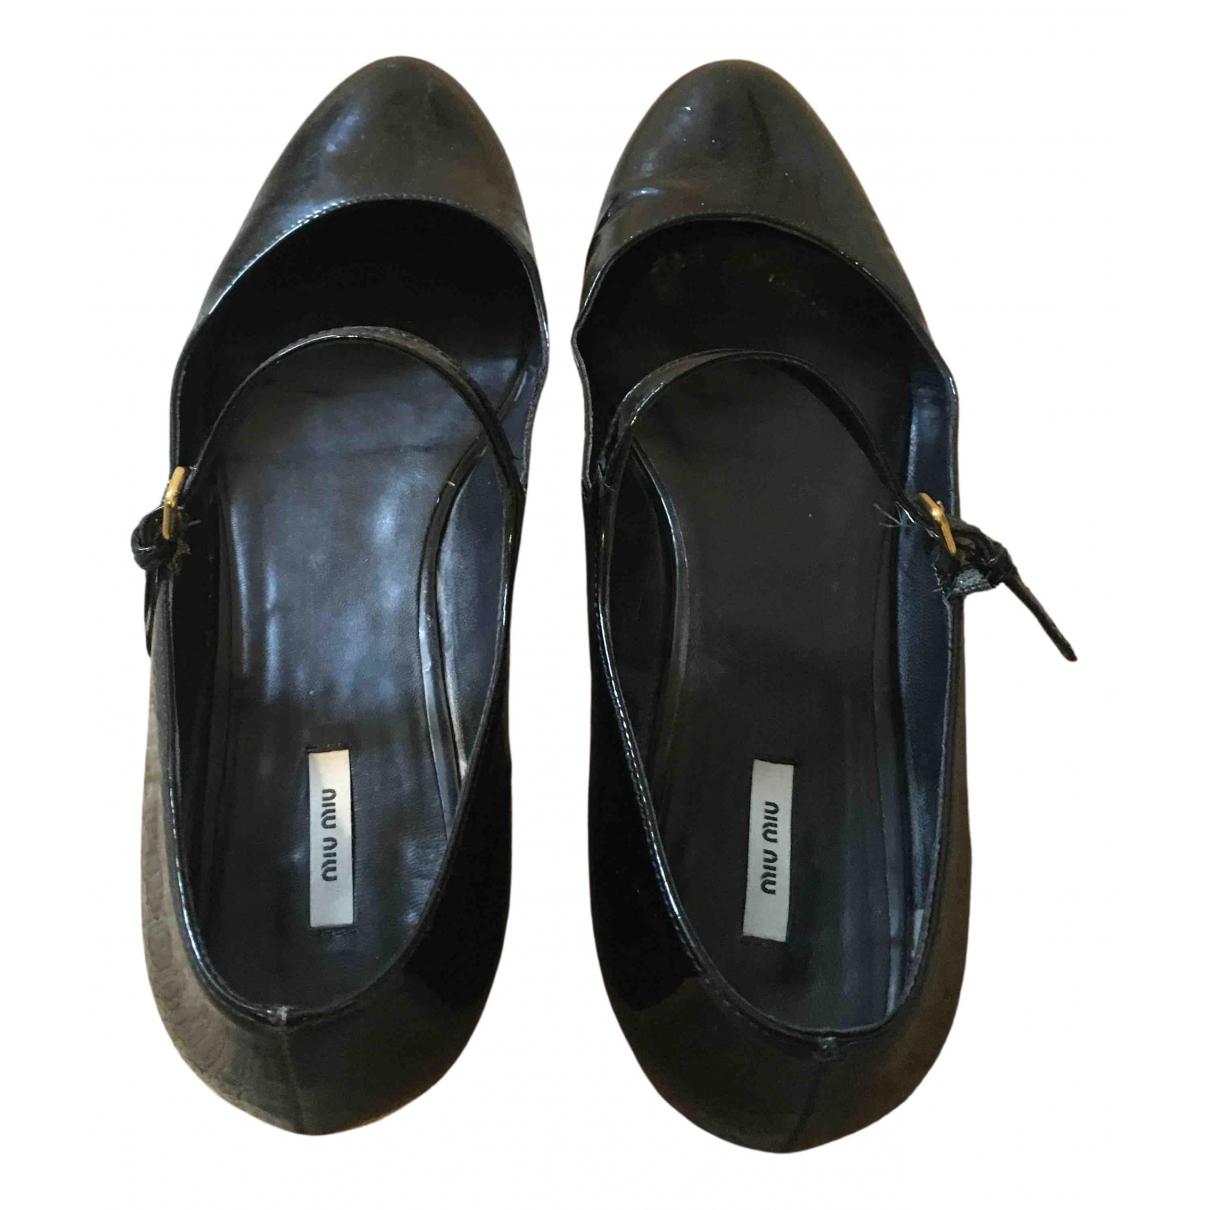 Miu Miu N Black Patent leather Ballet flats for Women 38 EU